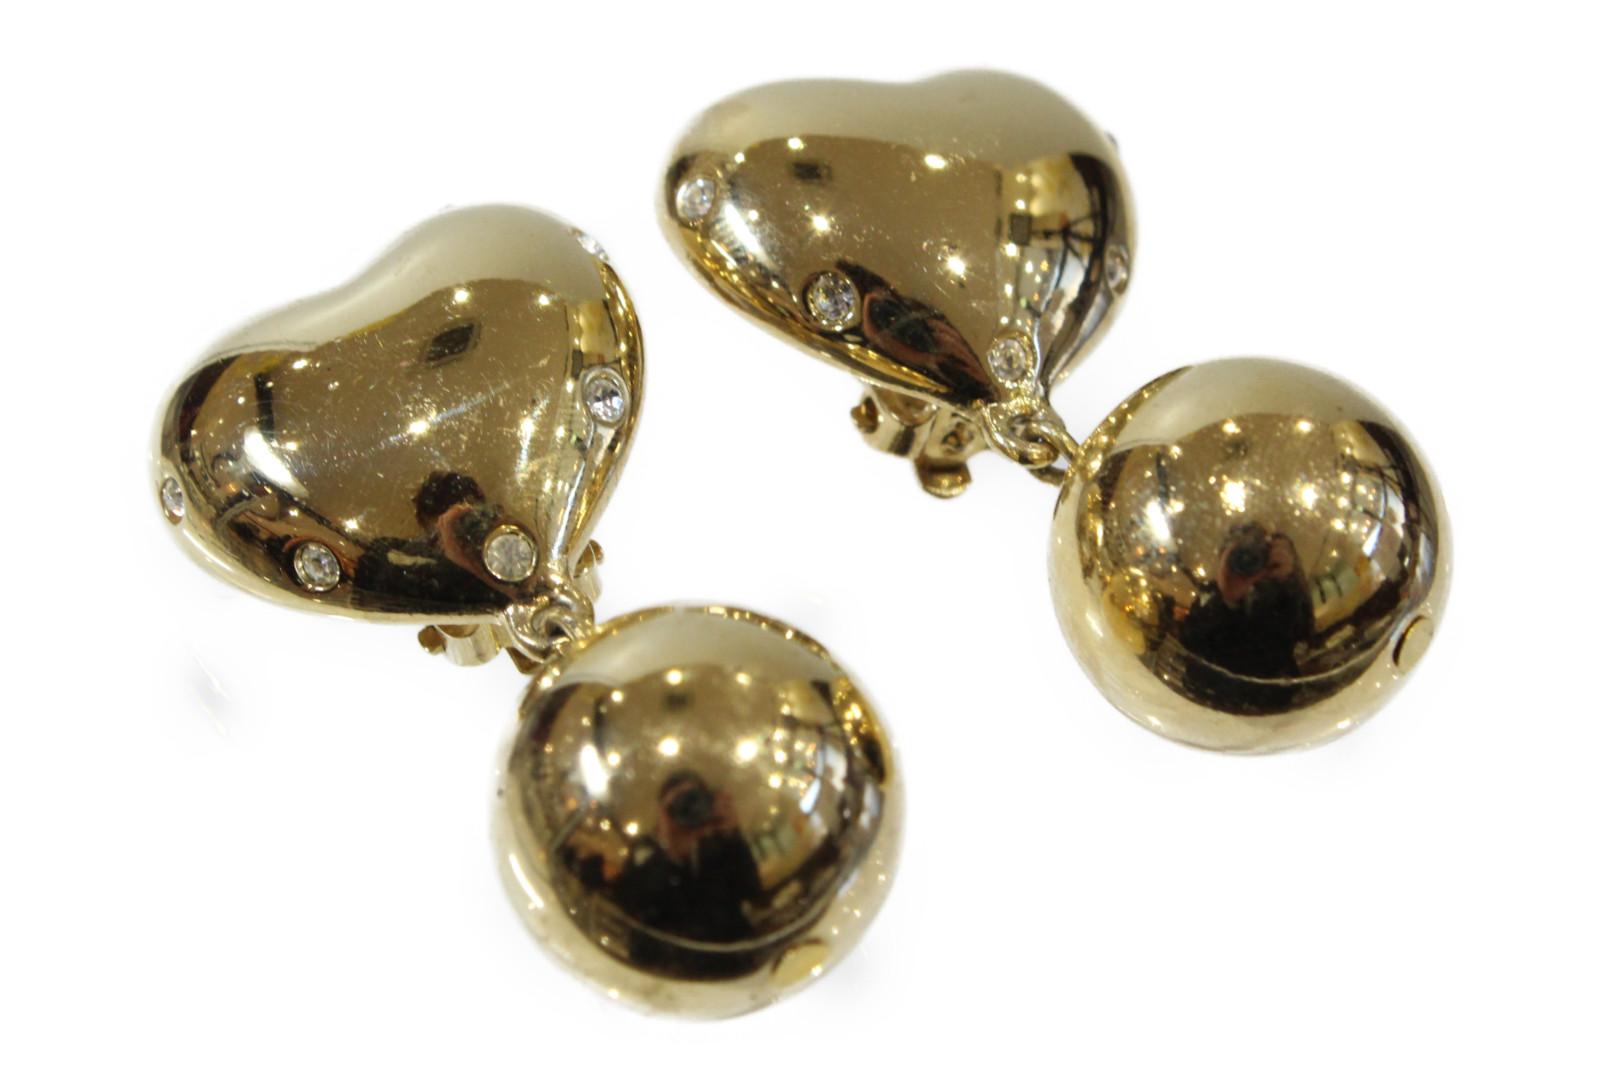 【GIVENCHY(ジバンシー)】ハートモチーフイヤリングゴールド 存在感 高級オシャレ ギフト包装可【中古】